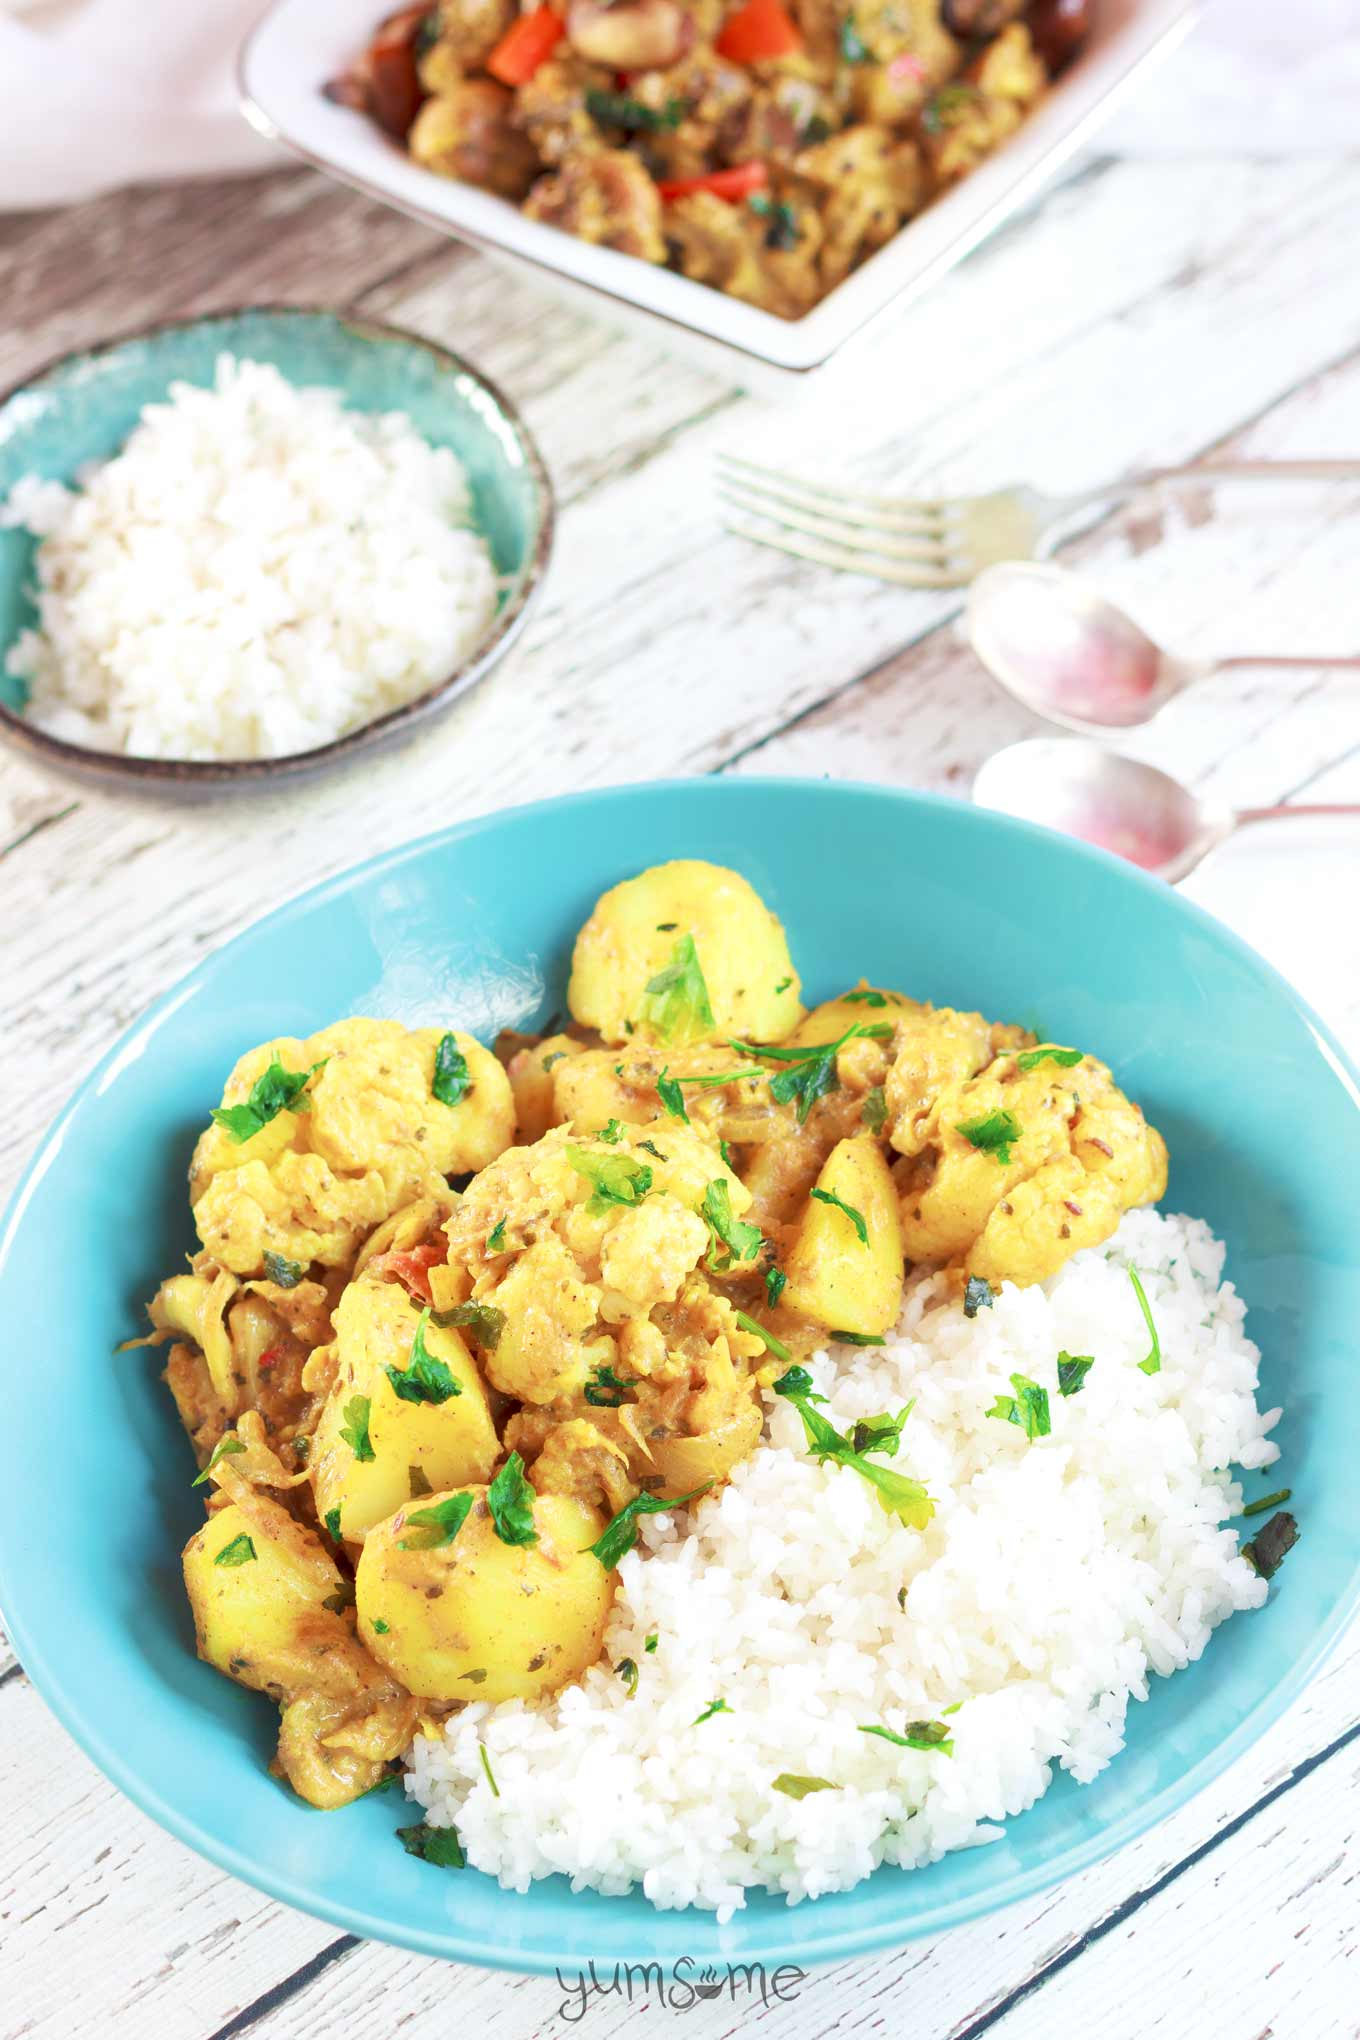 A bright blue bowl containing rice and simple vegan aloo gobi masala.